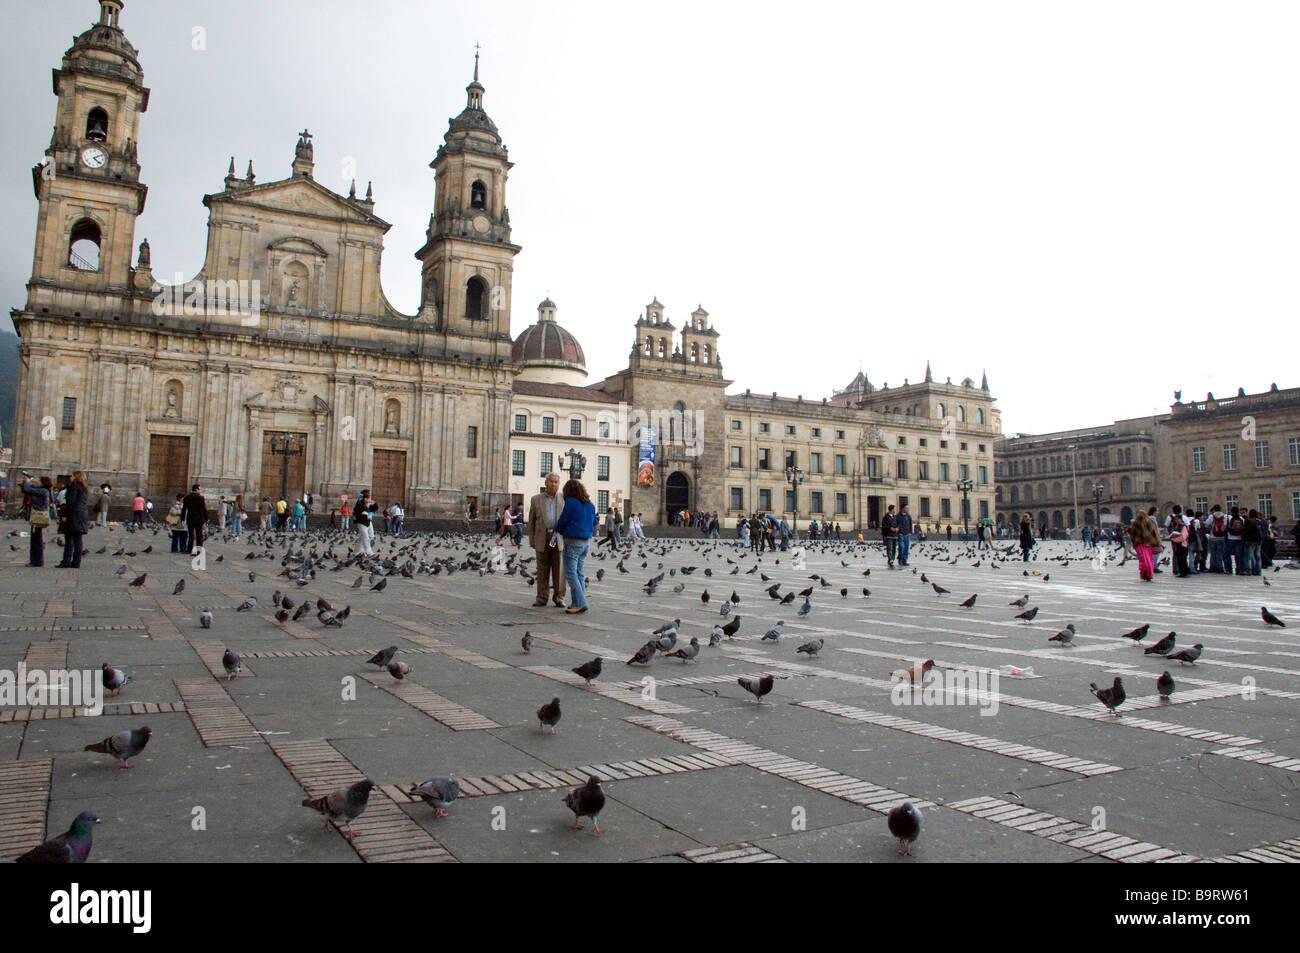 La Plaza de Bolívar, Bogotá, Colombia Imagen De Stock